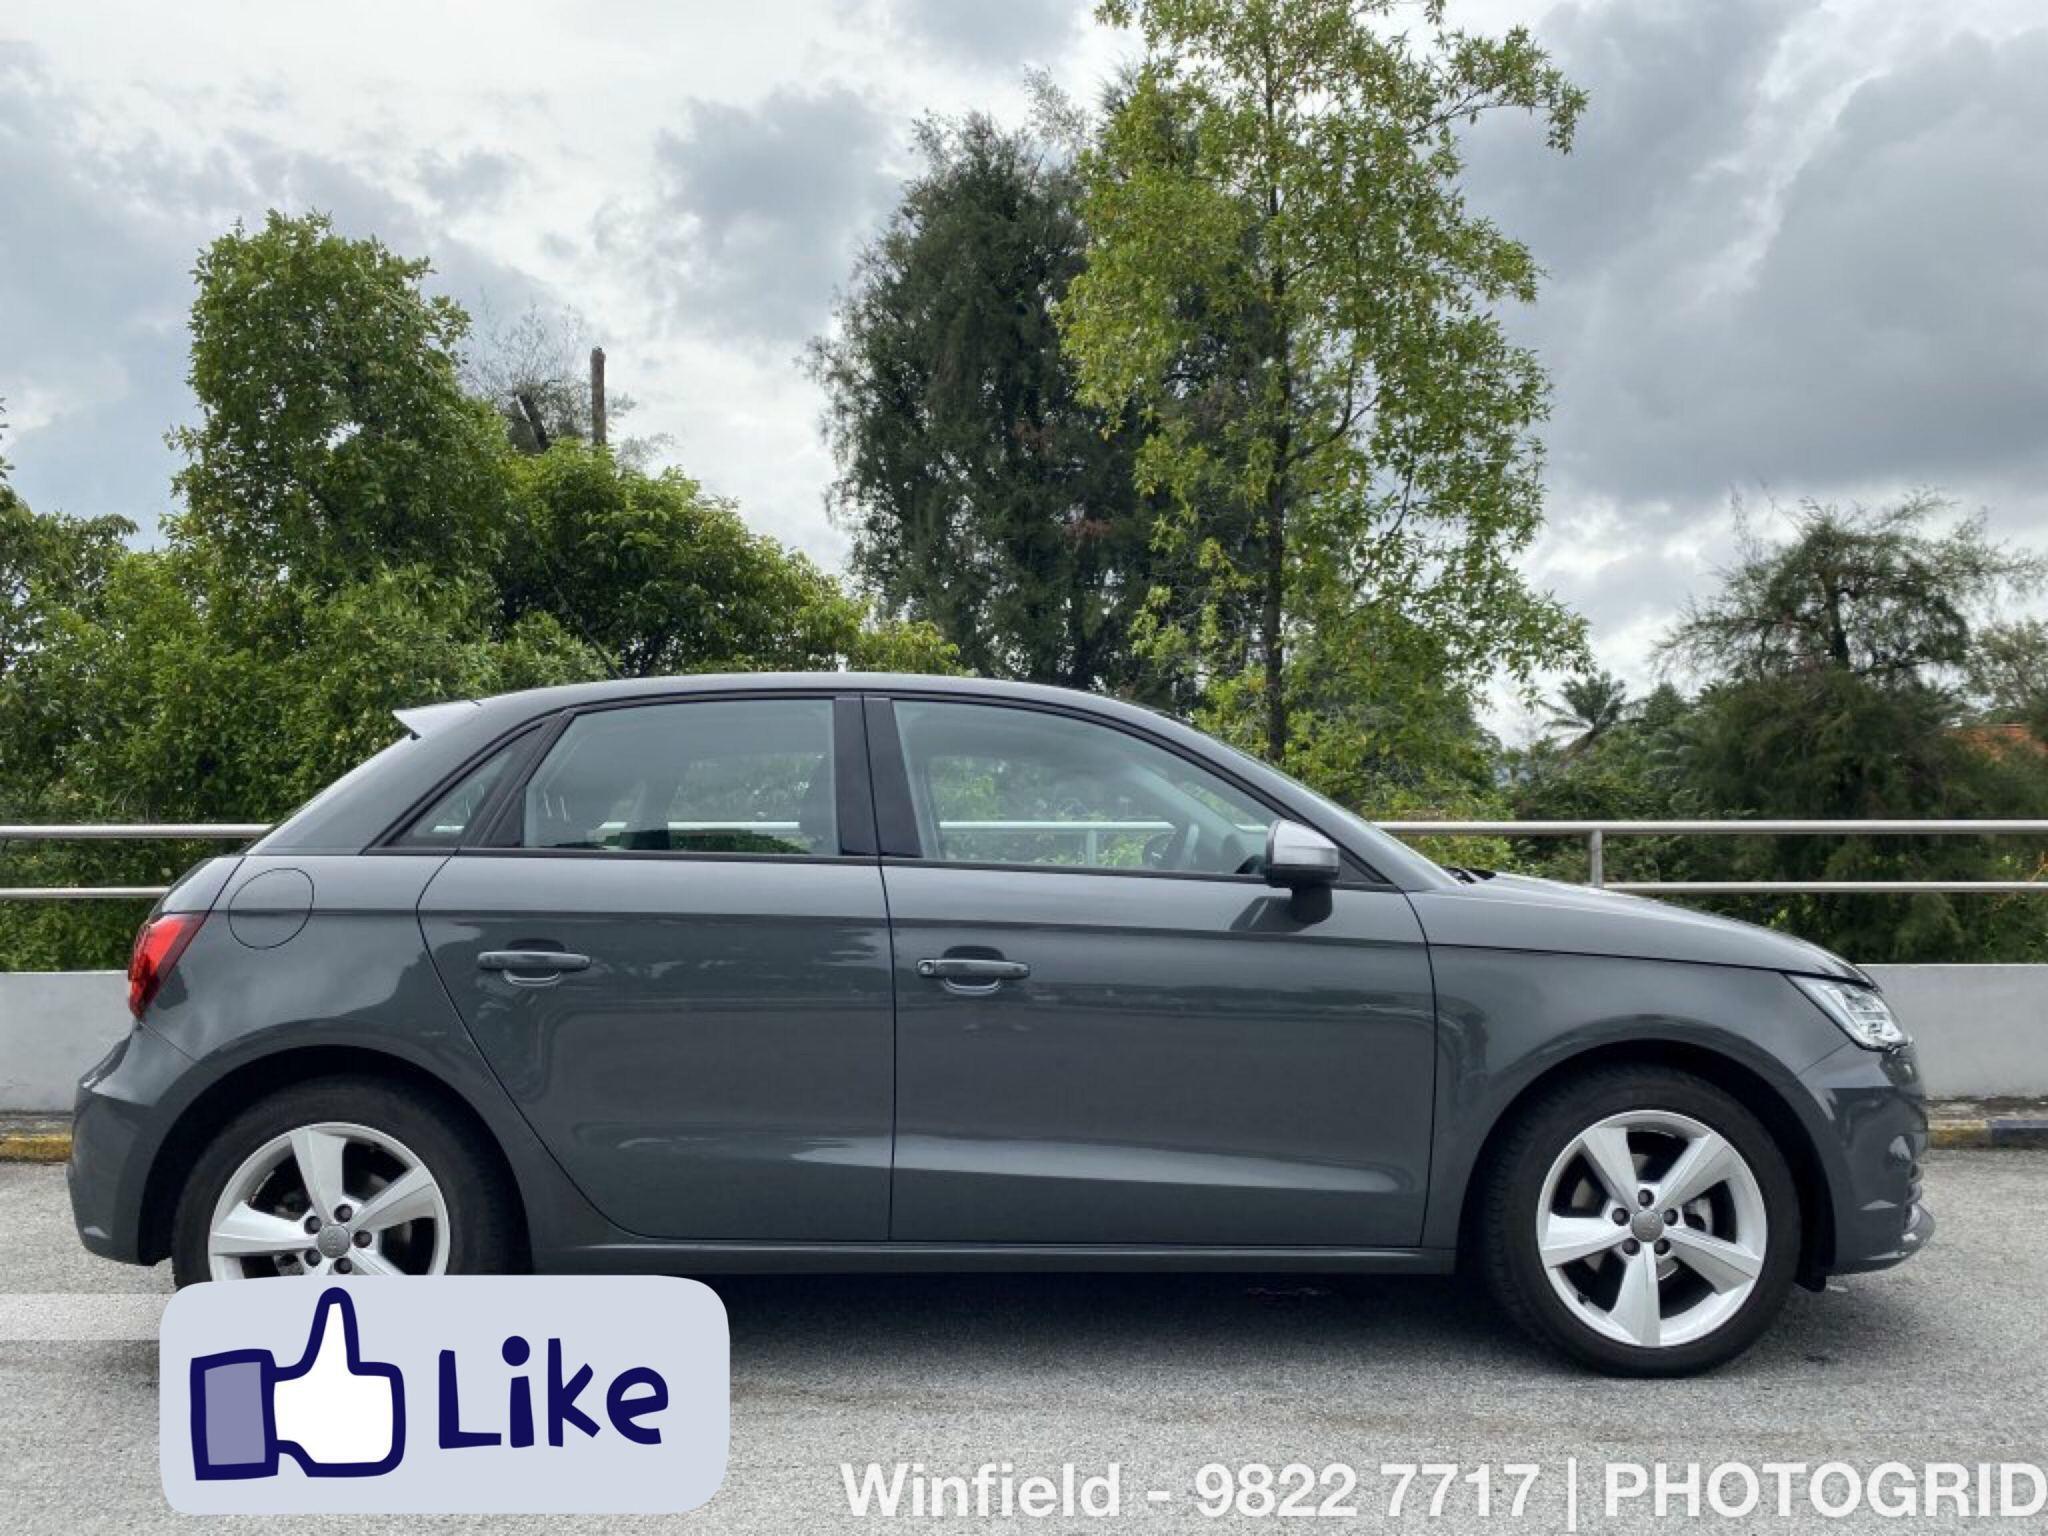 Audi A1 Sportback 1.0 TFSI S tronic 5-Dr Auto